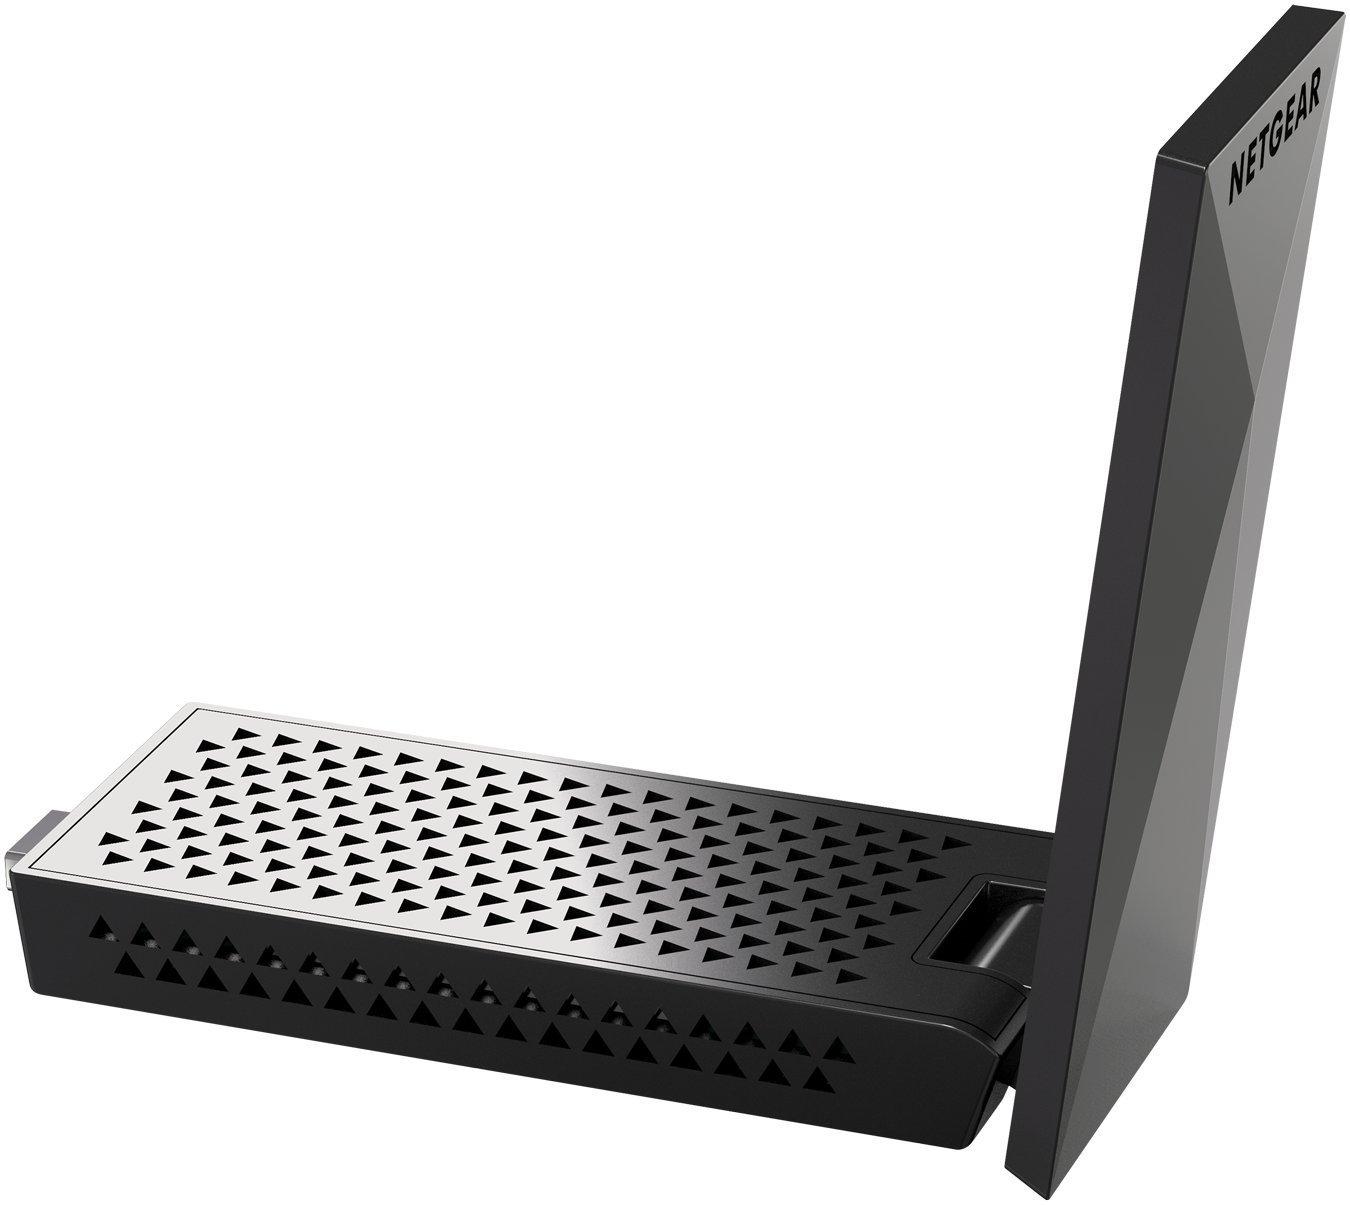 Netgear A6210-100PES - Adaptador de red inalámbrico USB de